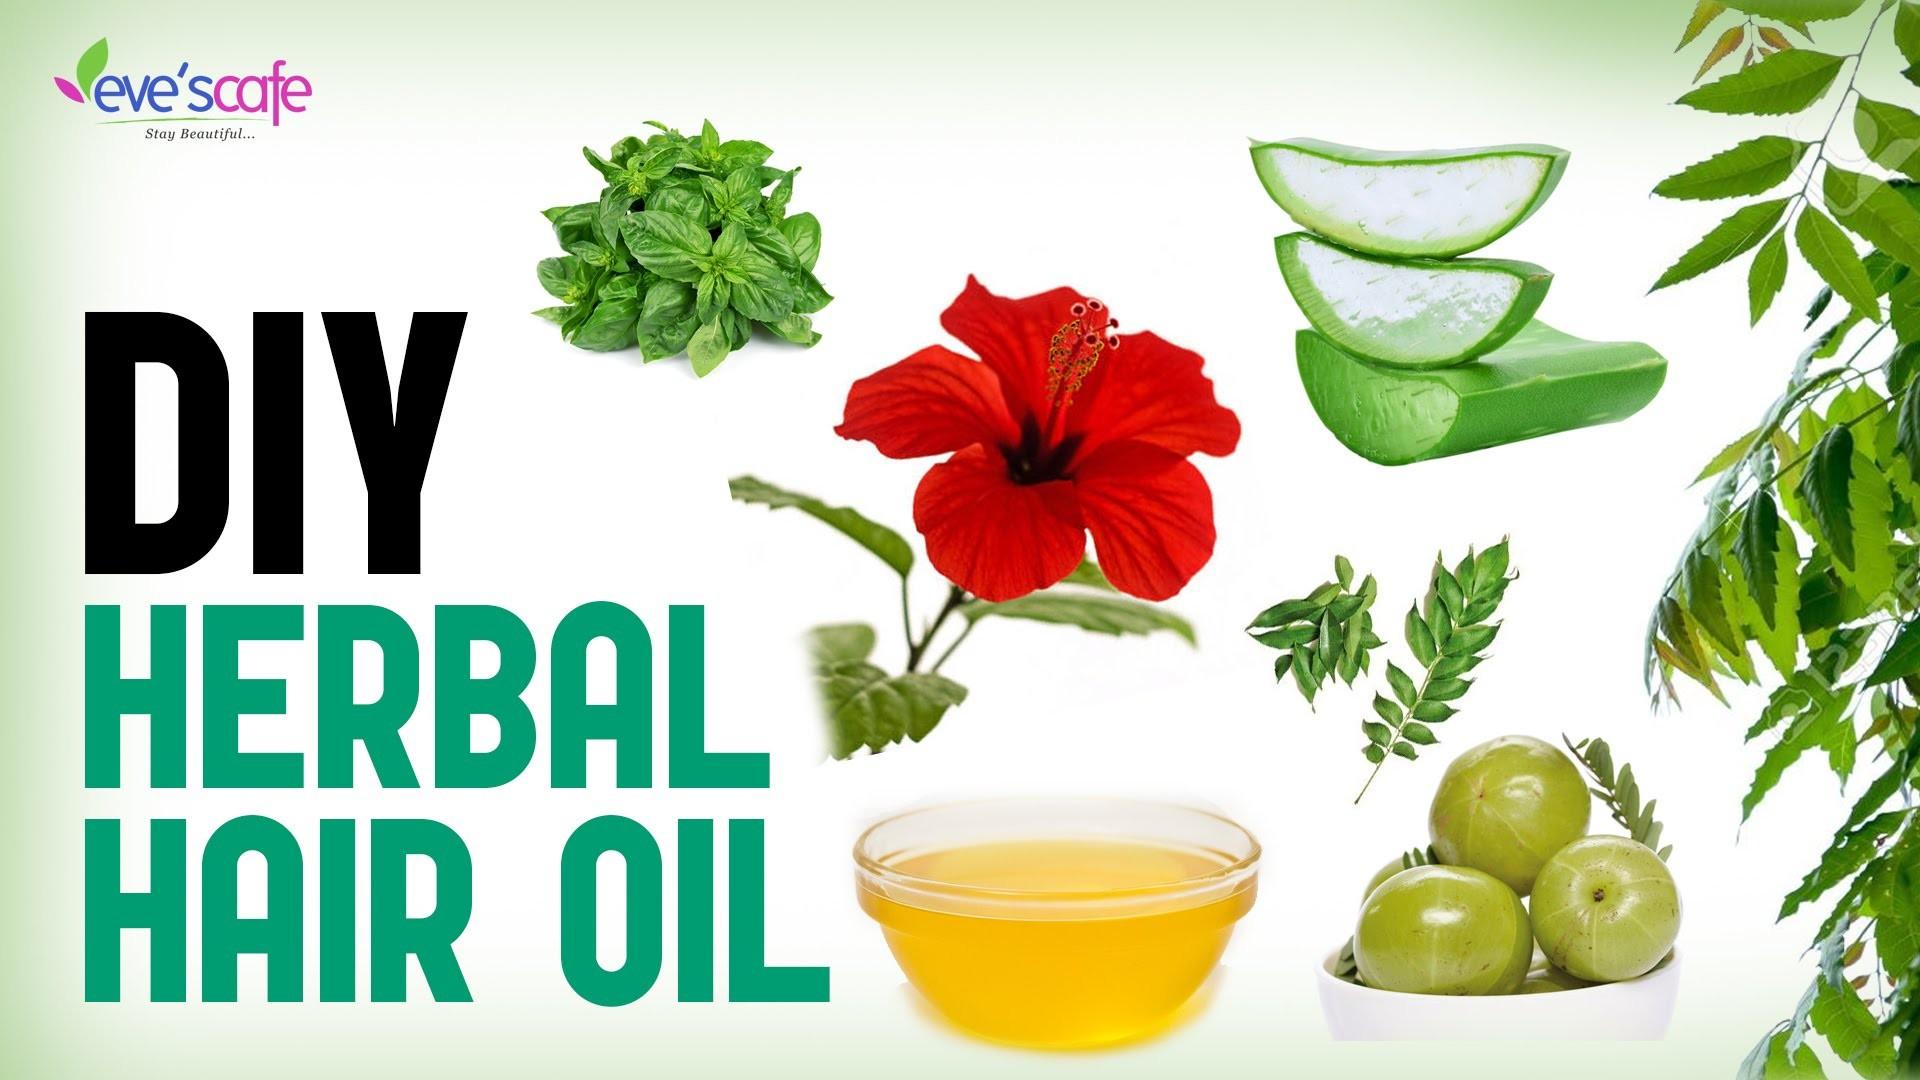 Herbal Hair Oil Preparation For Hair Growth and Stop Hair Loss - DIY